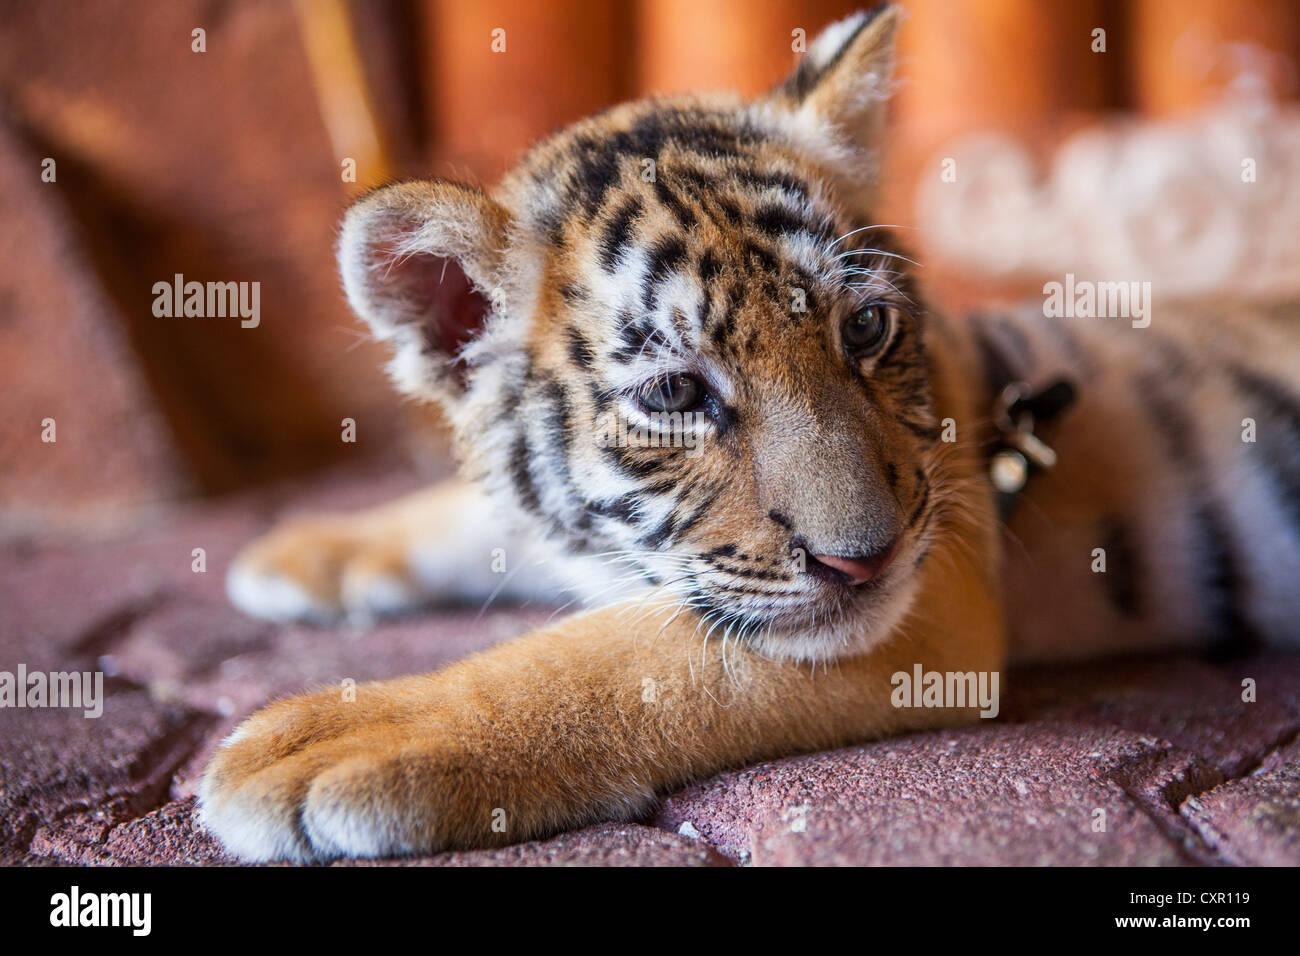 Ein Gefangener Baby-Tiger in Playa Del Carmen, Quintana Roo, Mexiko Stockbild